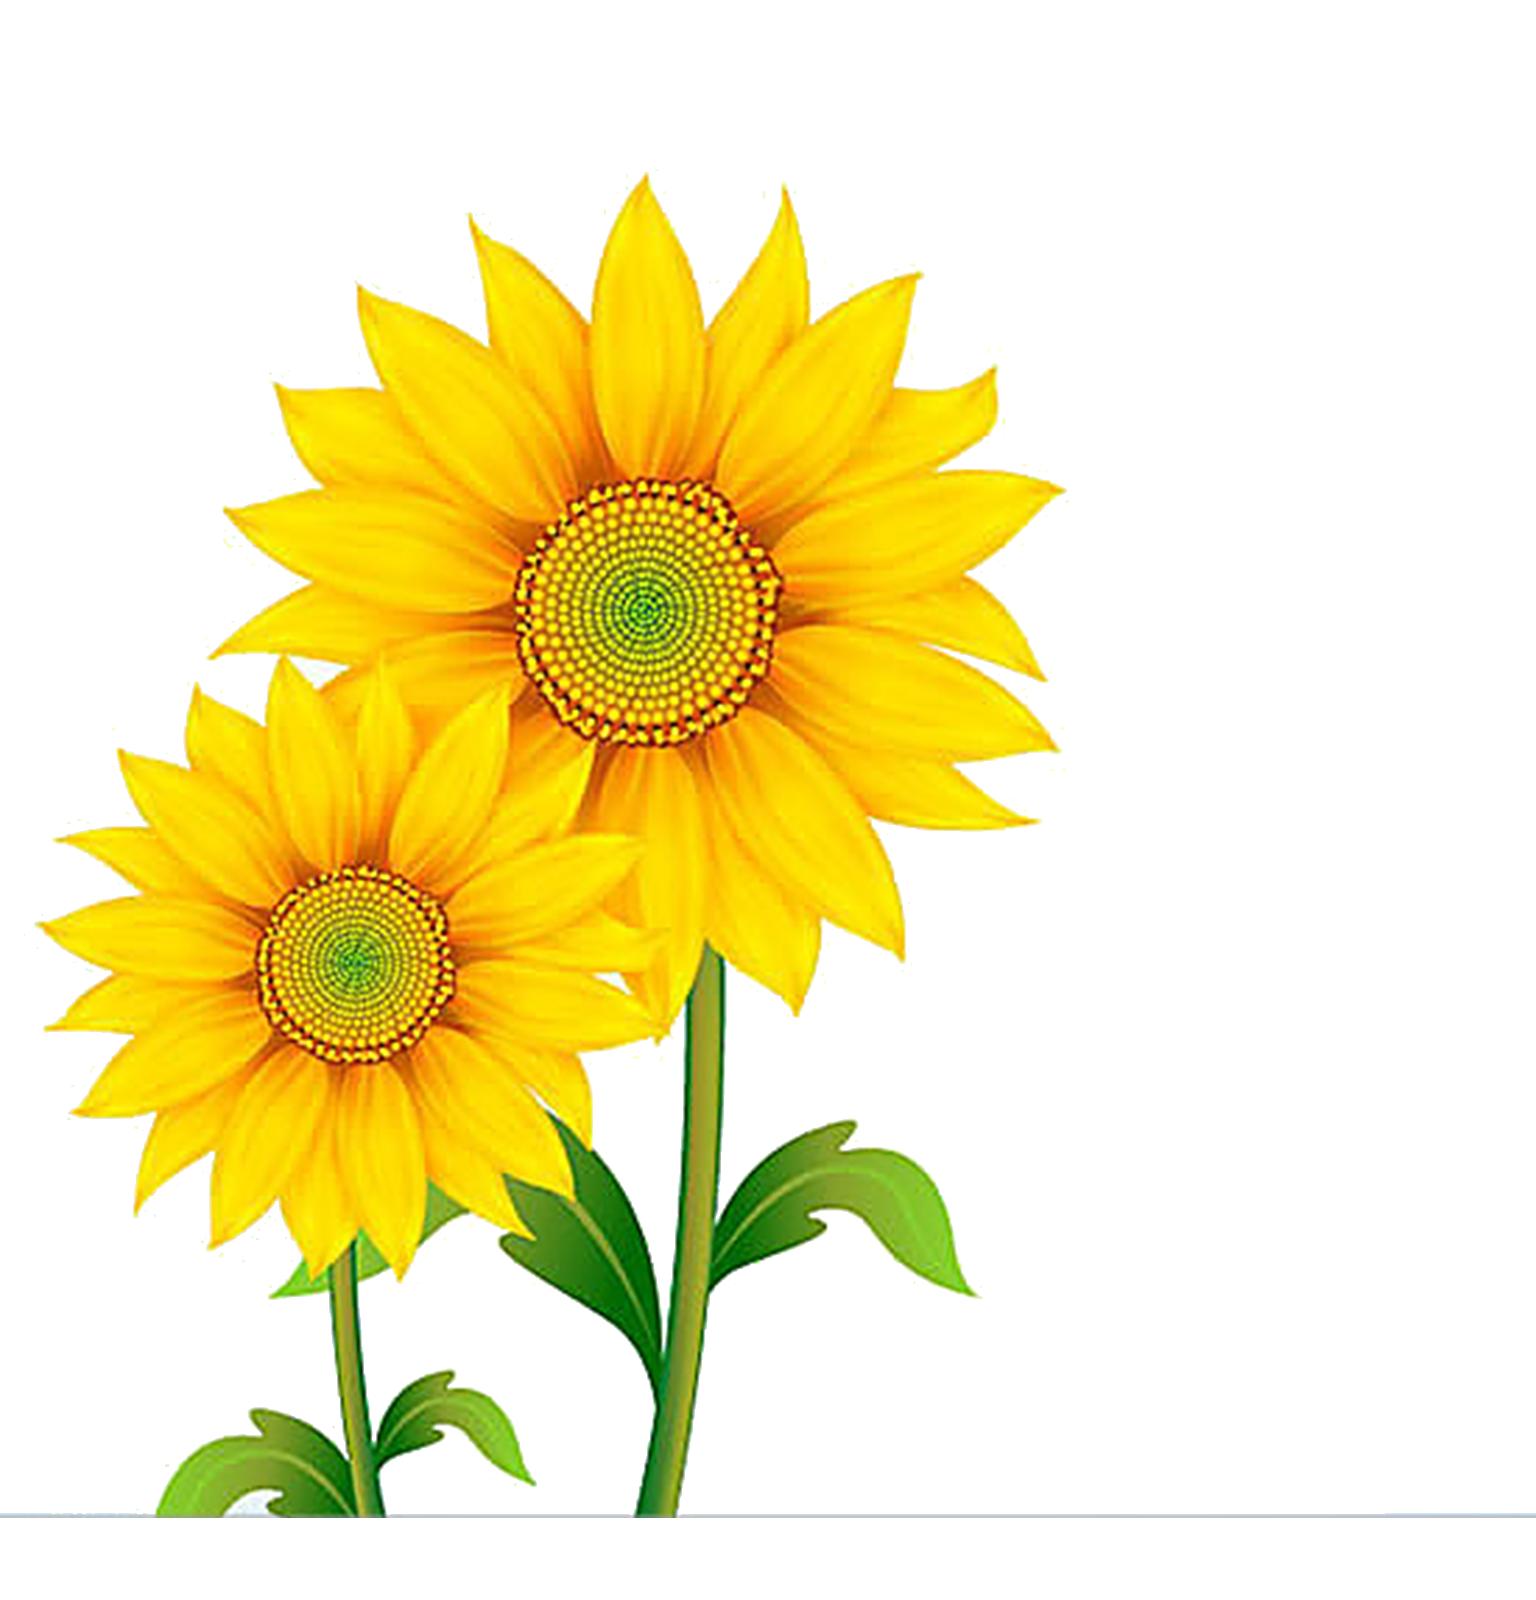 Daisy clipart sunflower, Daisy sunflower Transparent FREE ...